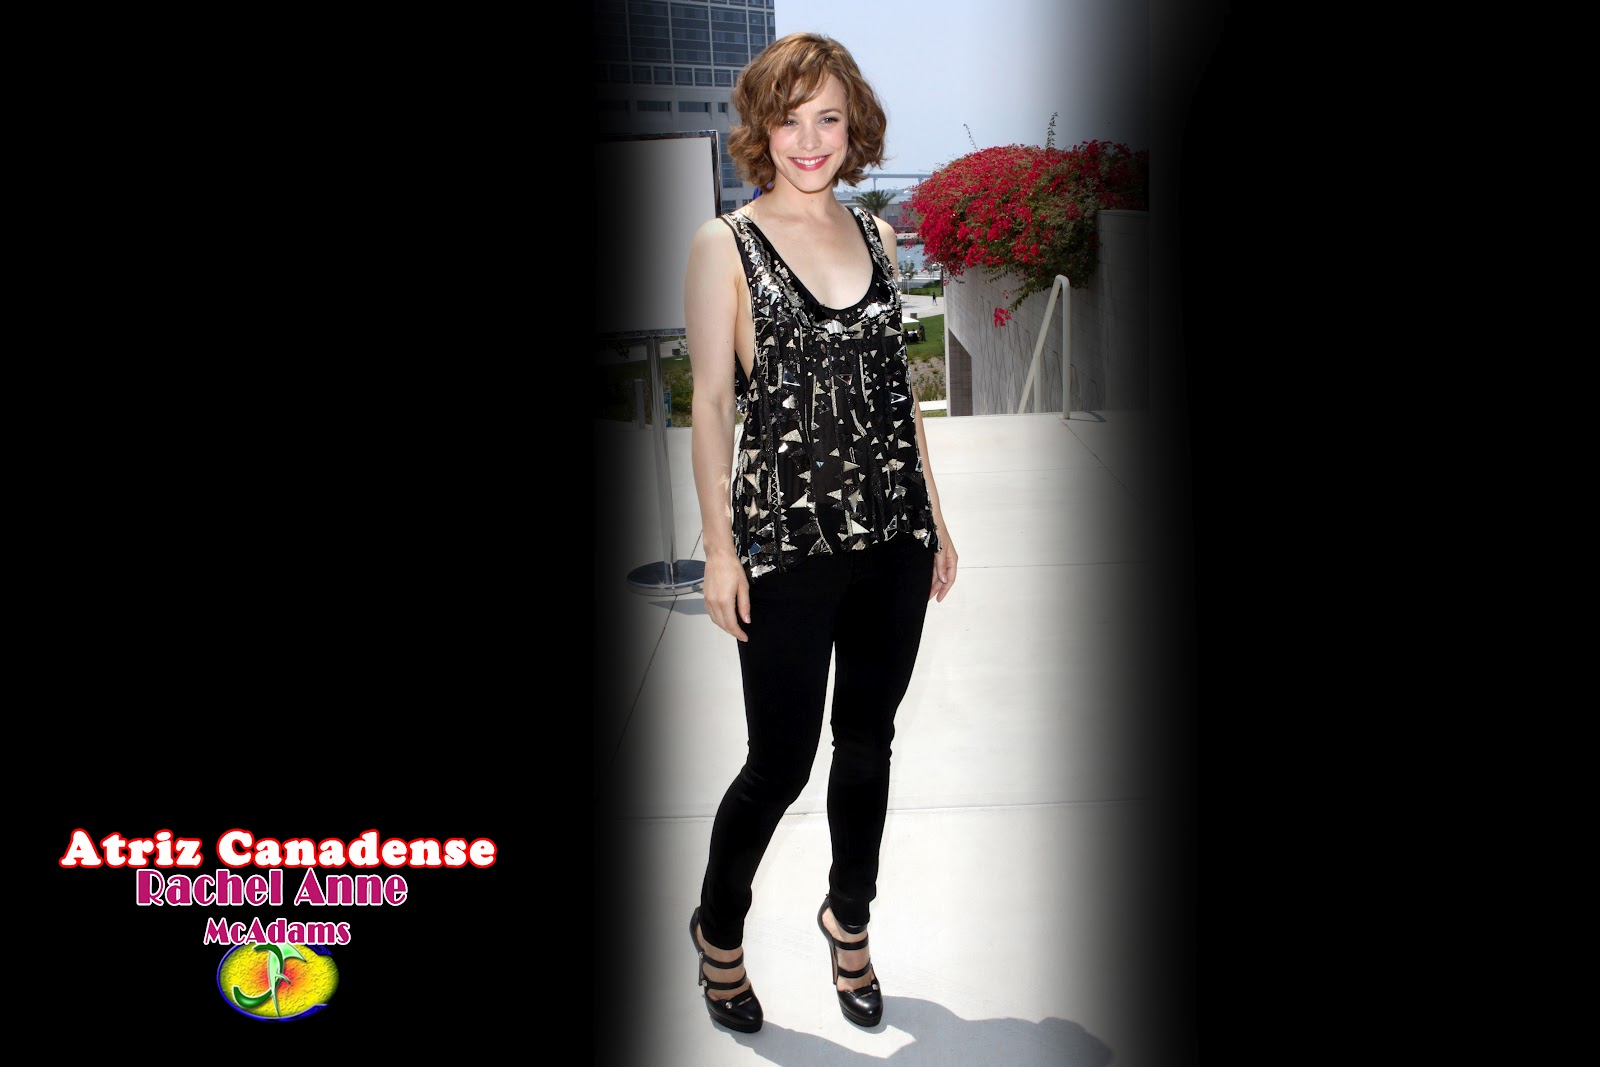 http://2.bp.blogspot.com/-ljdC3yOrVhI/T-fu7gfTpfI/AAAAAAAAEKY/6BGR1toFBiU/s1600/FAT+-+Rachel+Anne+McAdams+-+Canad%C3%A1-London+-+781117+-+33+anos+-+01.jpg